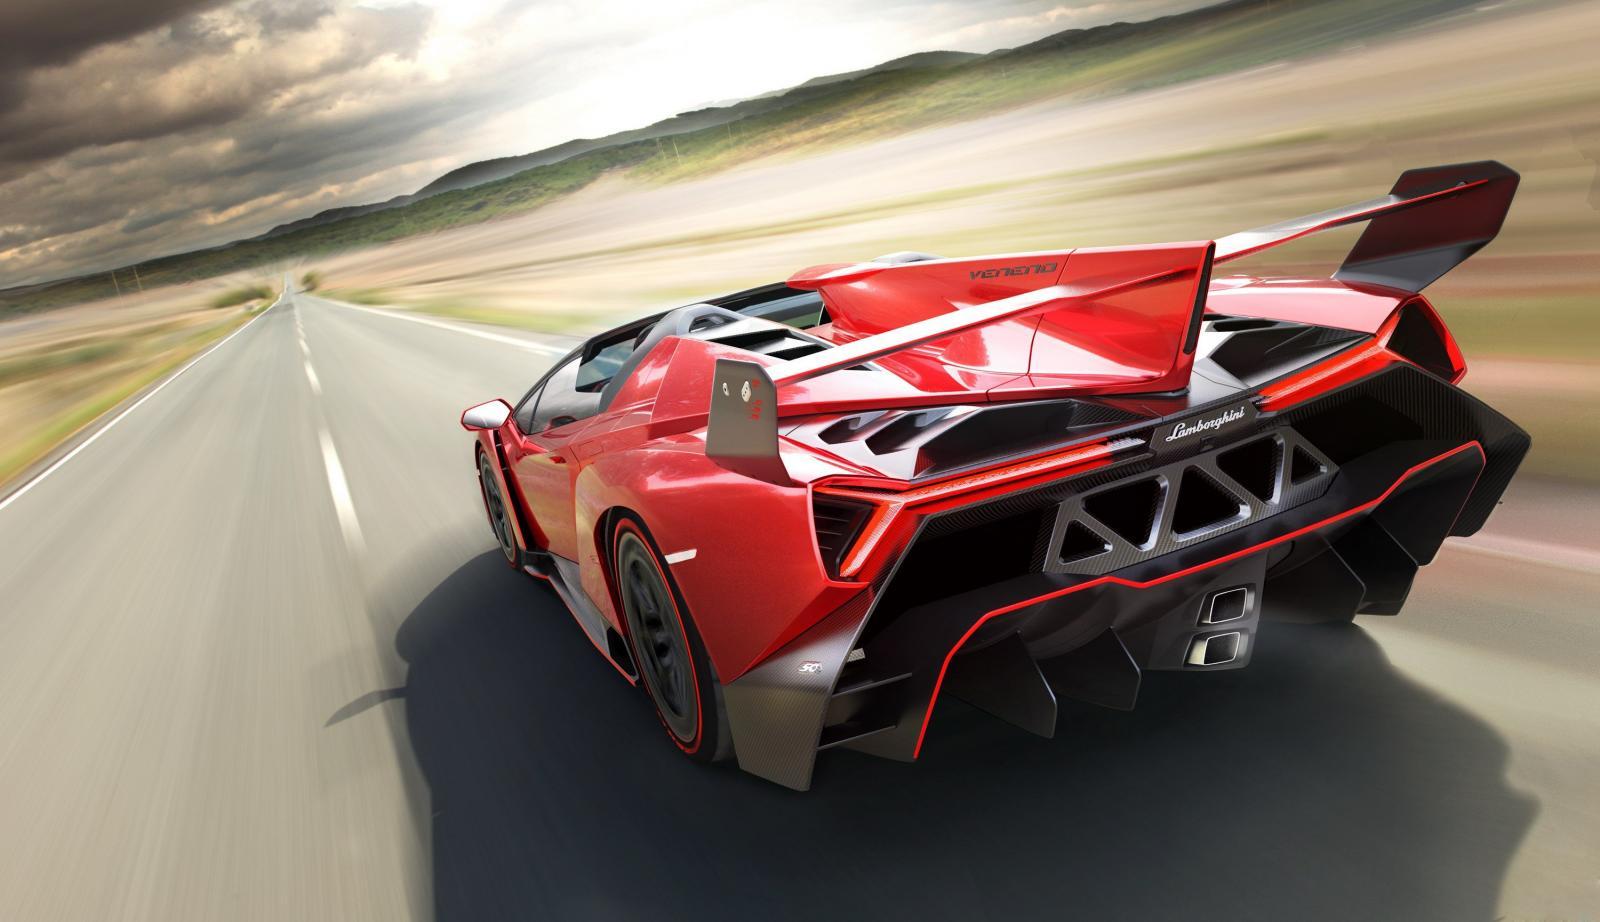 Los carros mas rapidos del mundo Lamborghini Veneno